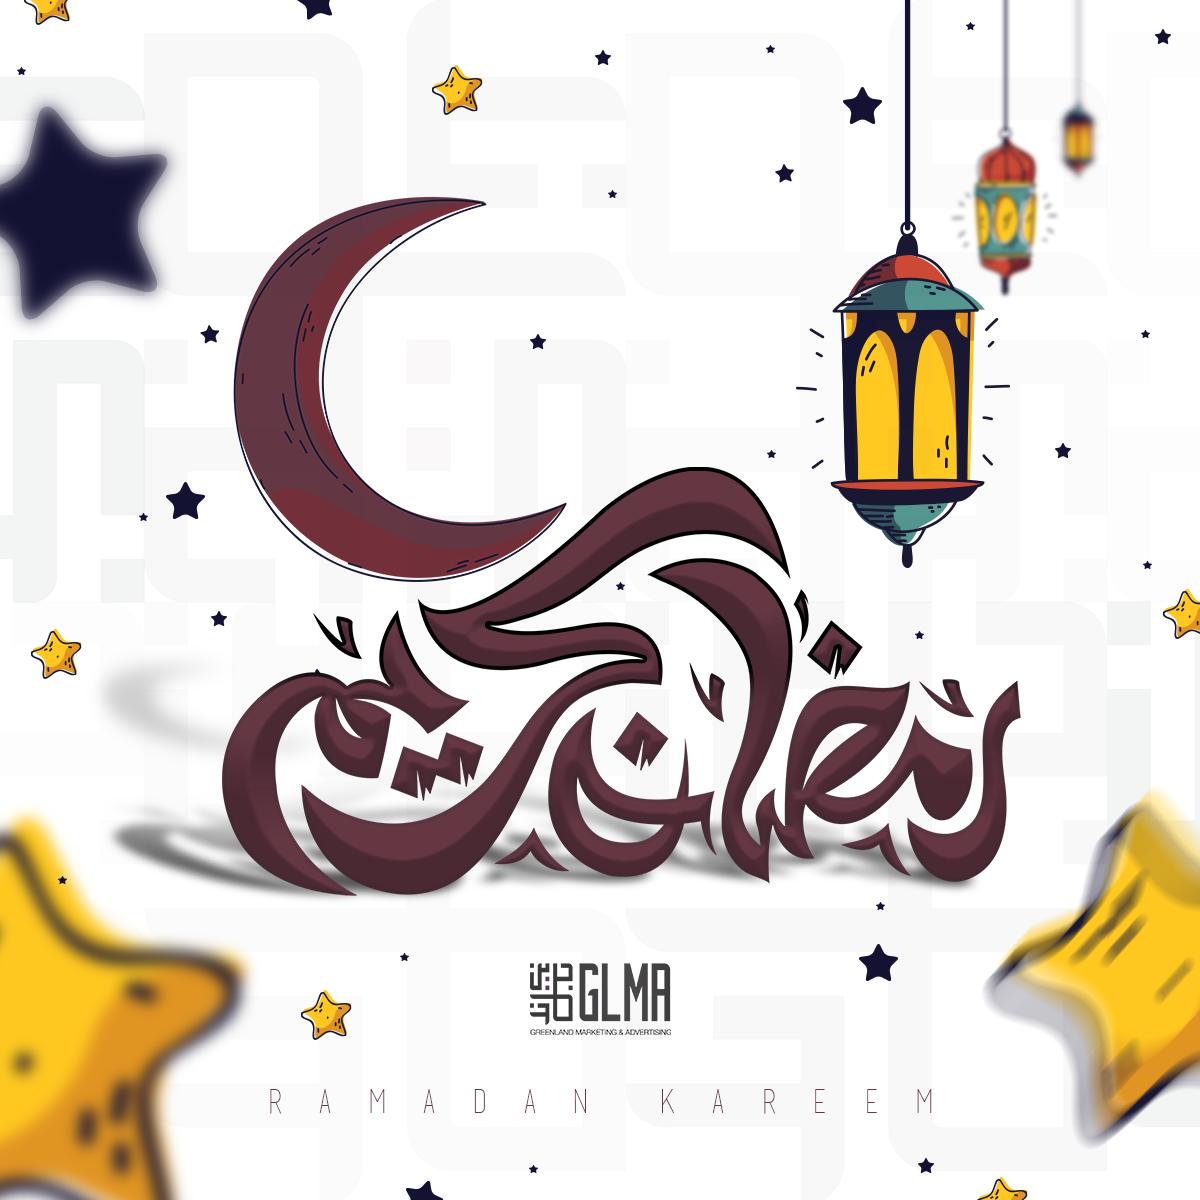 Ramadan Kareem Ramadan Kareem Ramadan Greetings Ramadan